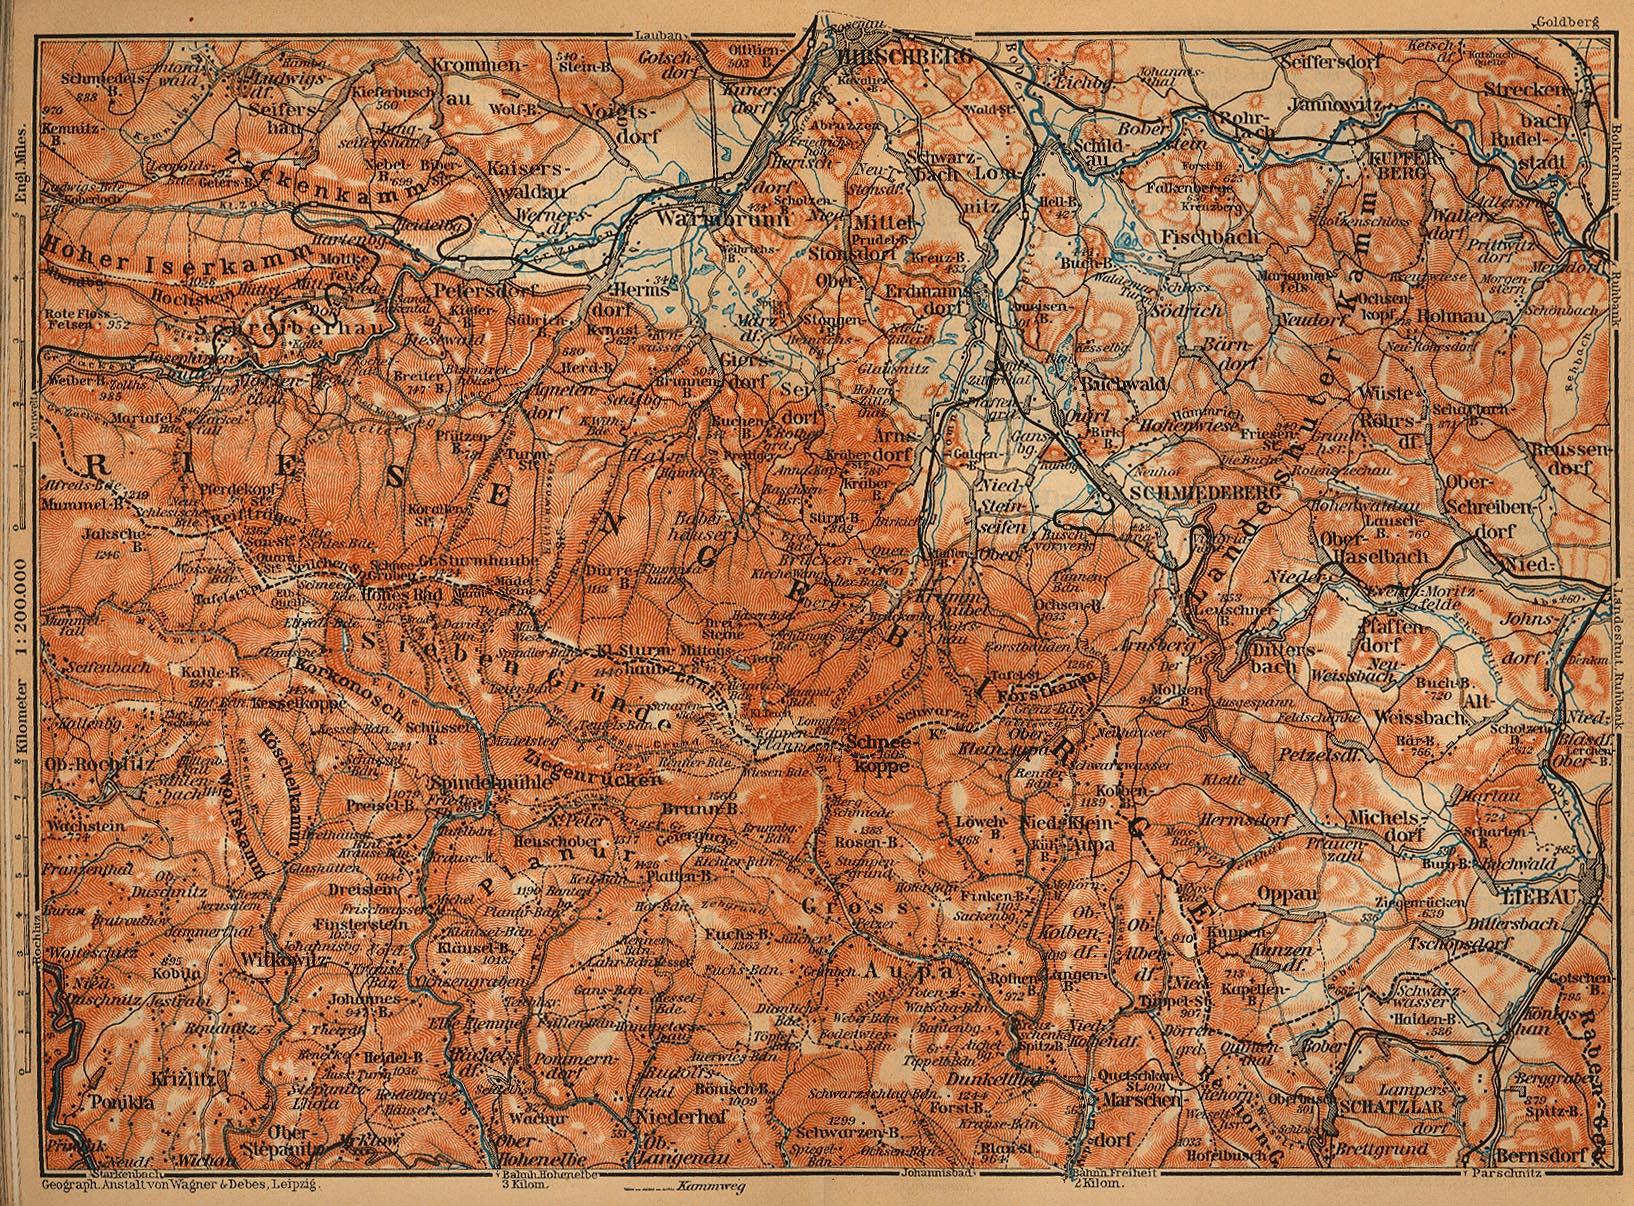 Mapa de las Karkonosze, Polonia - República Checa 1910